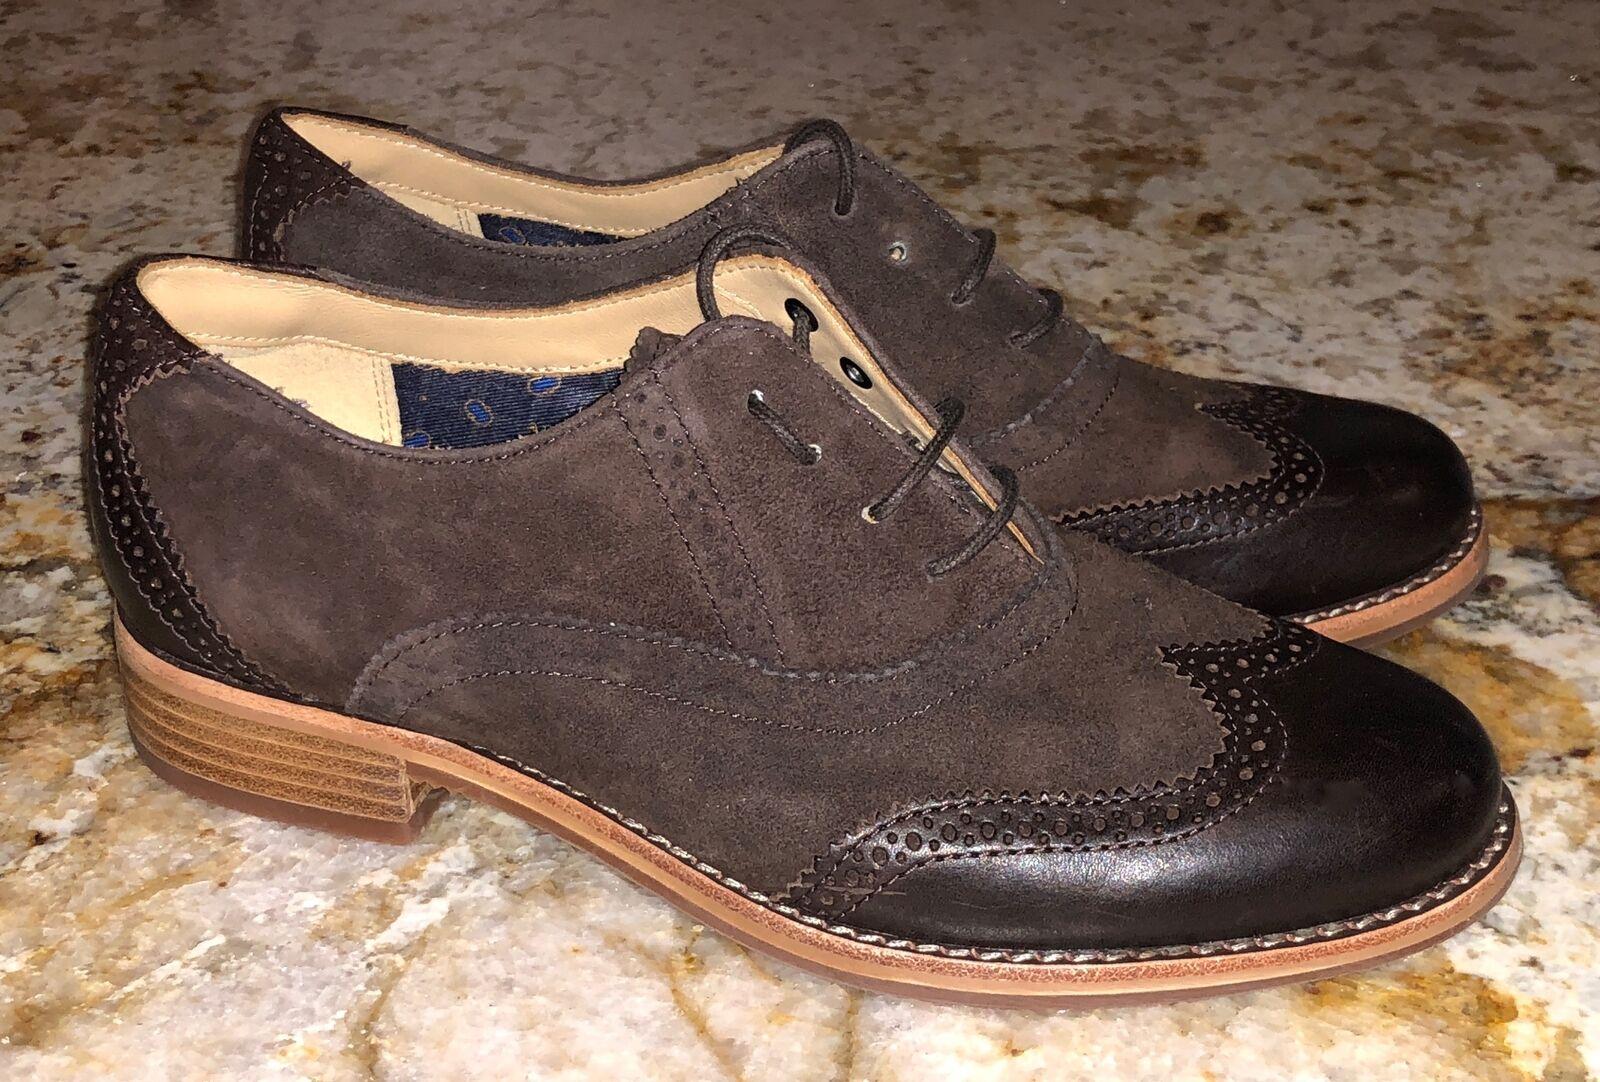 SEBAGO Claremont Brogue Wingtip Brown Suede Oxford shoes NEW Womens Sz 7 8